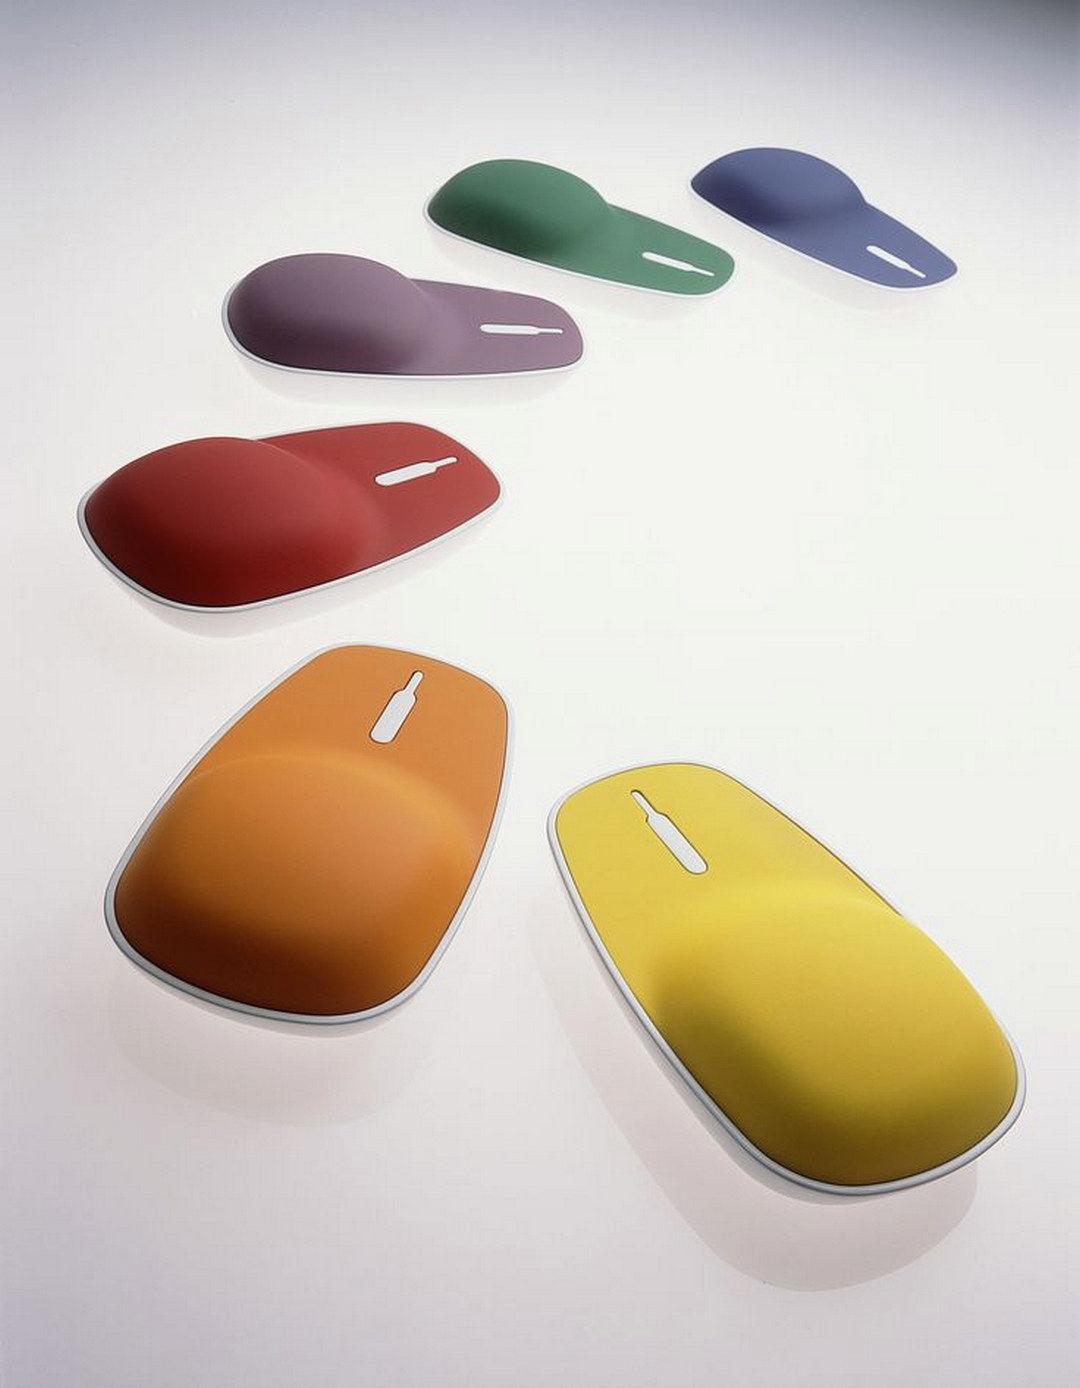 Bathroom Gadgets Technology - Gadgets For Men Top 10 ...